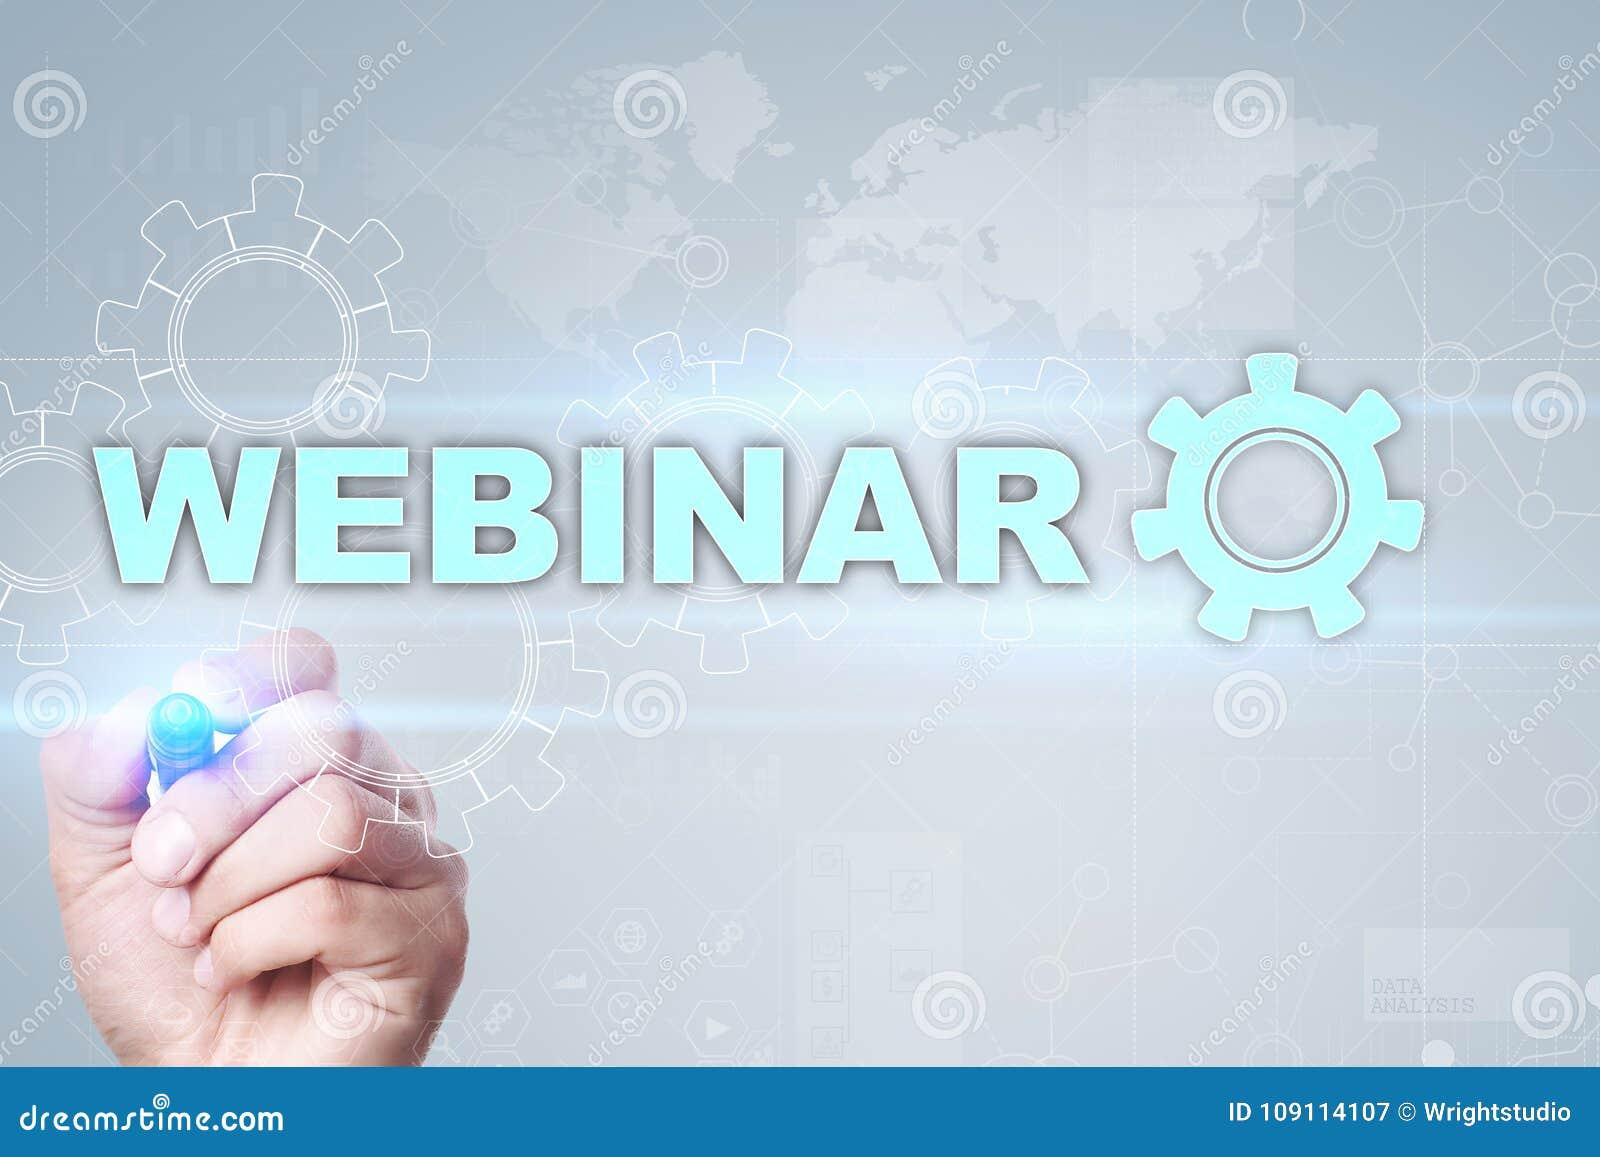 Webinar Ε-μαθαίνοντας, σε απευθείας σύνδεση έννοια εκπαίδευσης ανάπτυξη προσωπική οθόνη εικονική